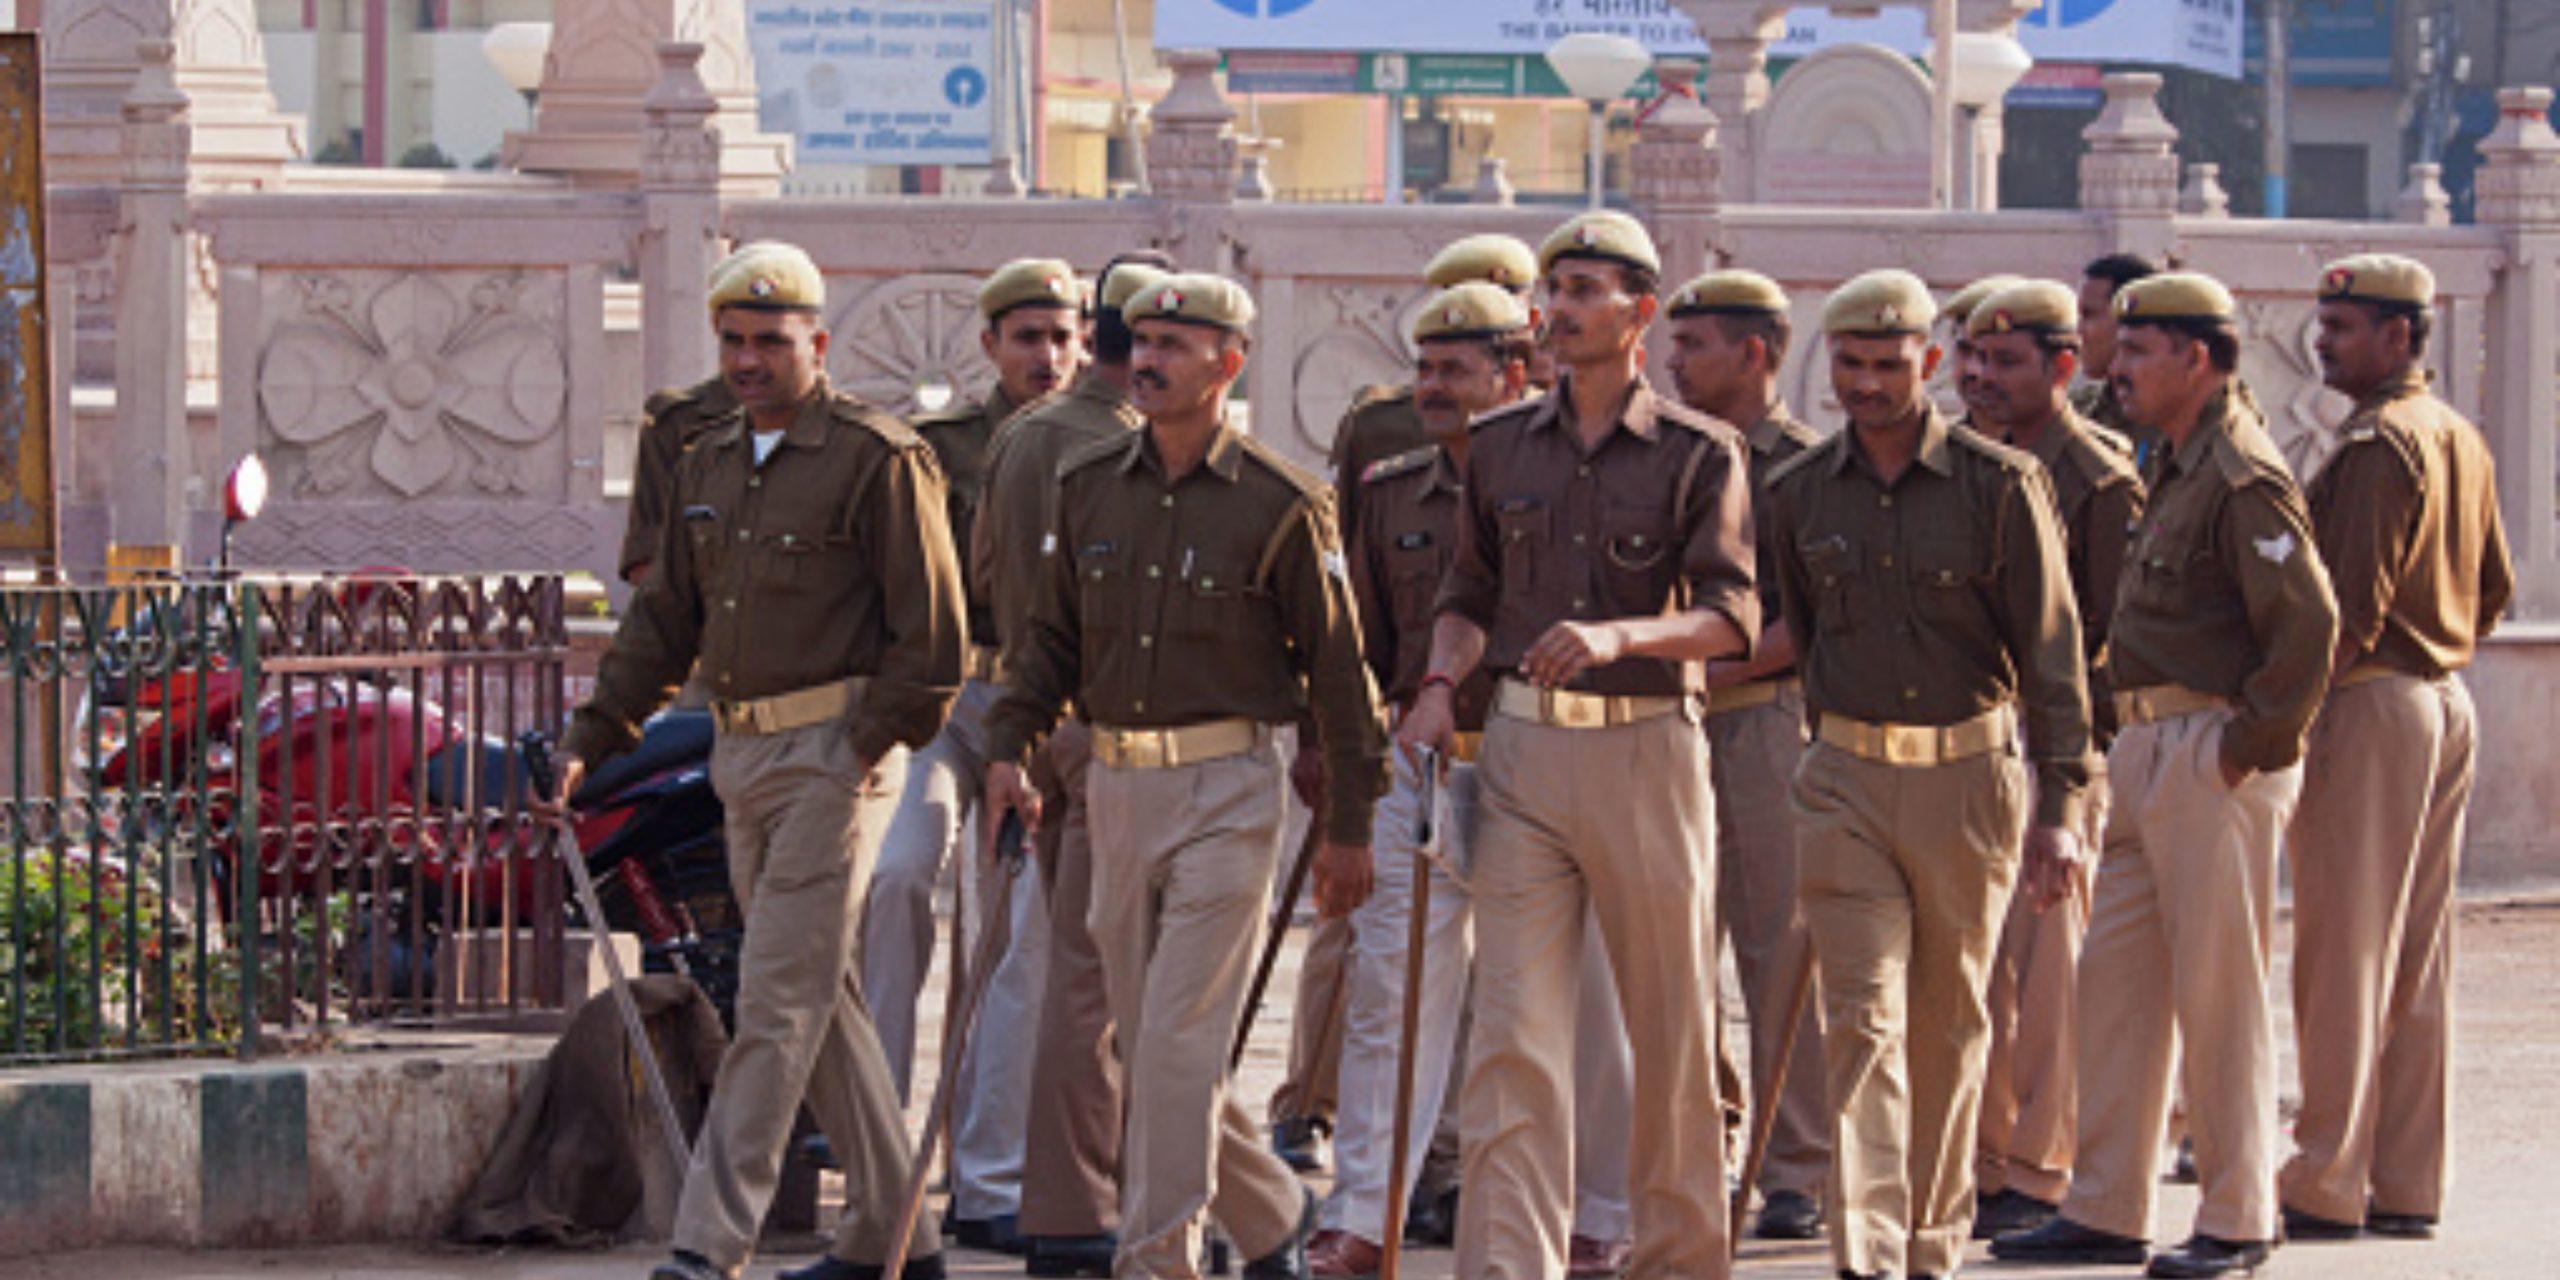 Impulse CCTV & PoE Switching l Multiple Installations for the Uttar Pradesh Police Force